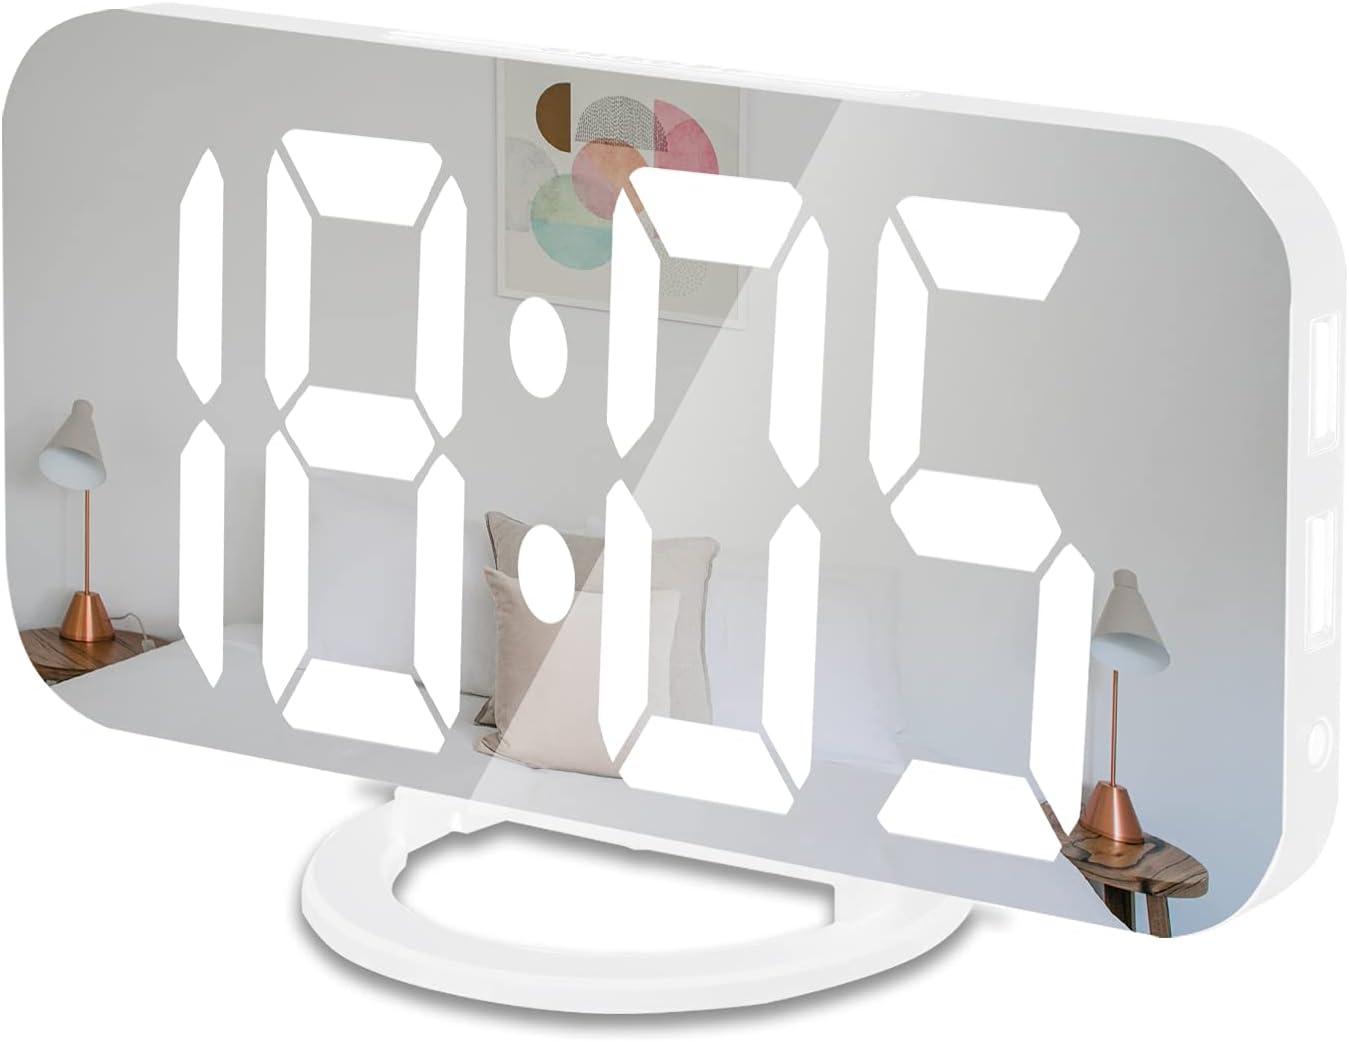 VASTARS Digital Max 54% OFF Challenge the lowest price of Japan Alarm Clock 6.6